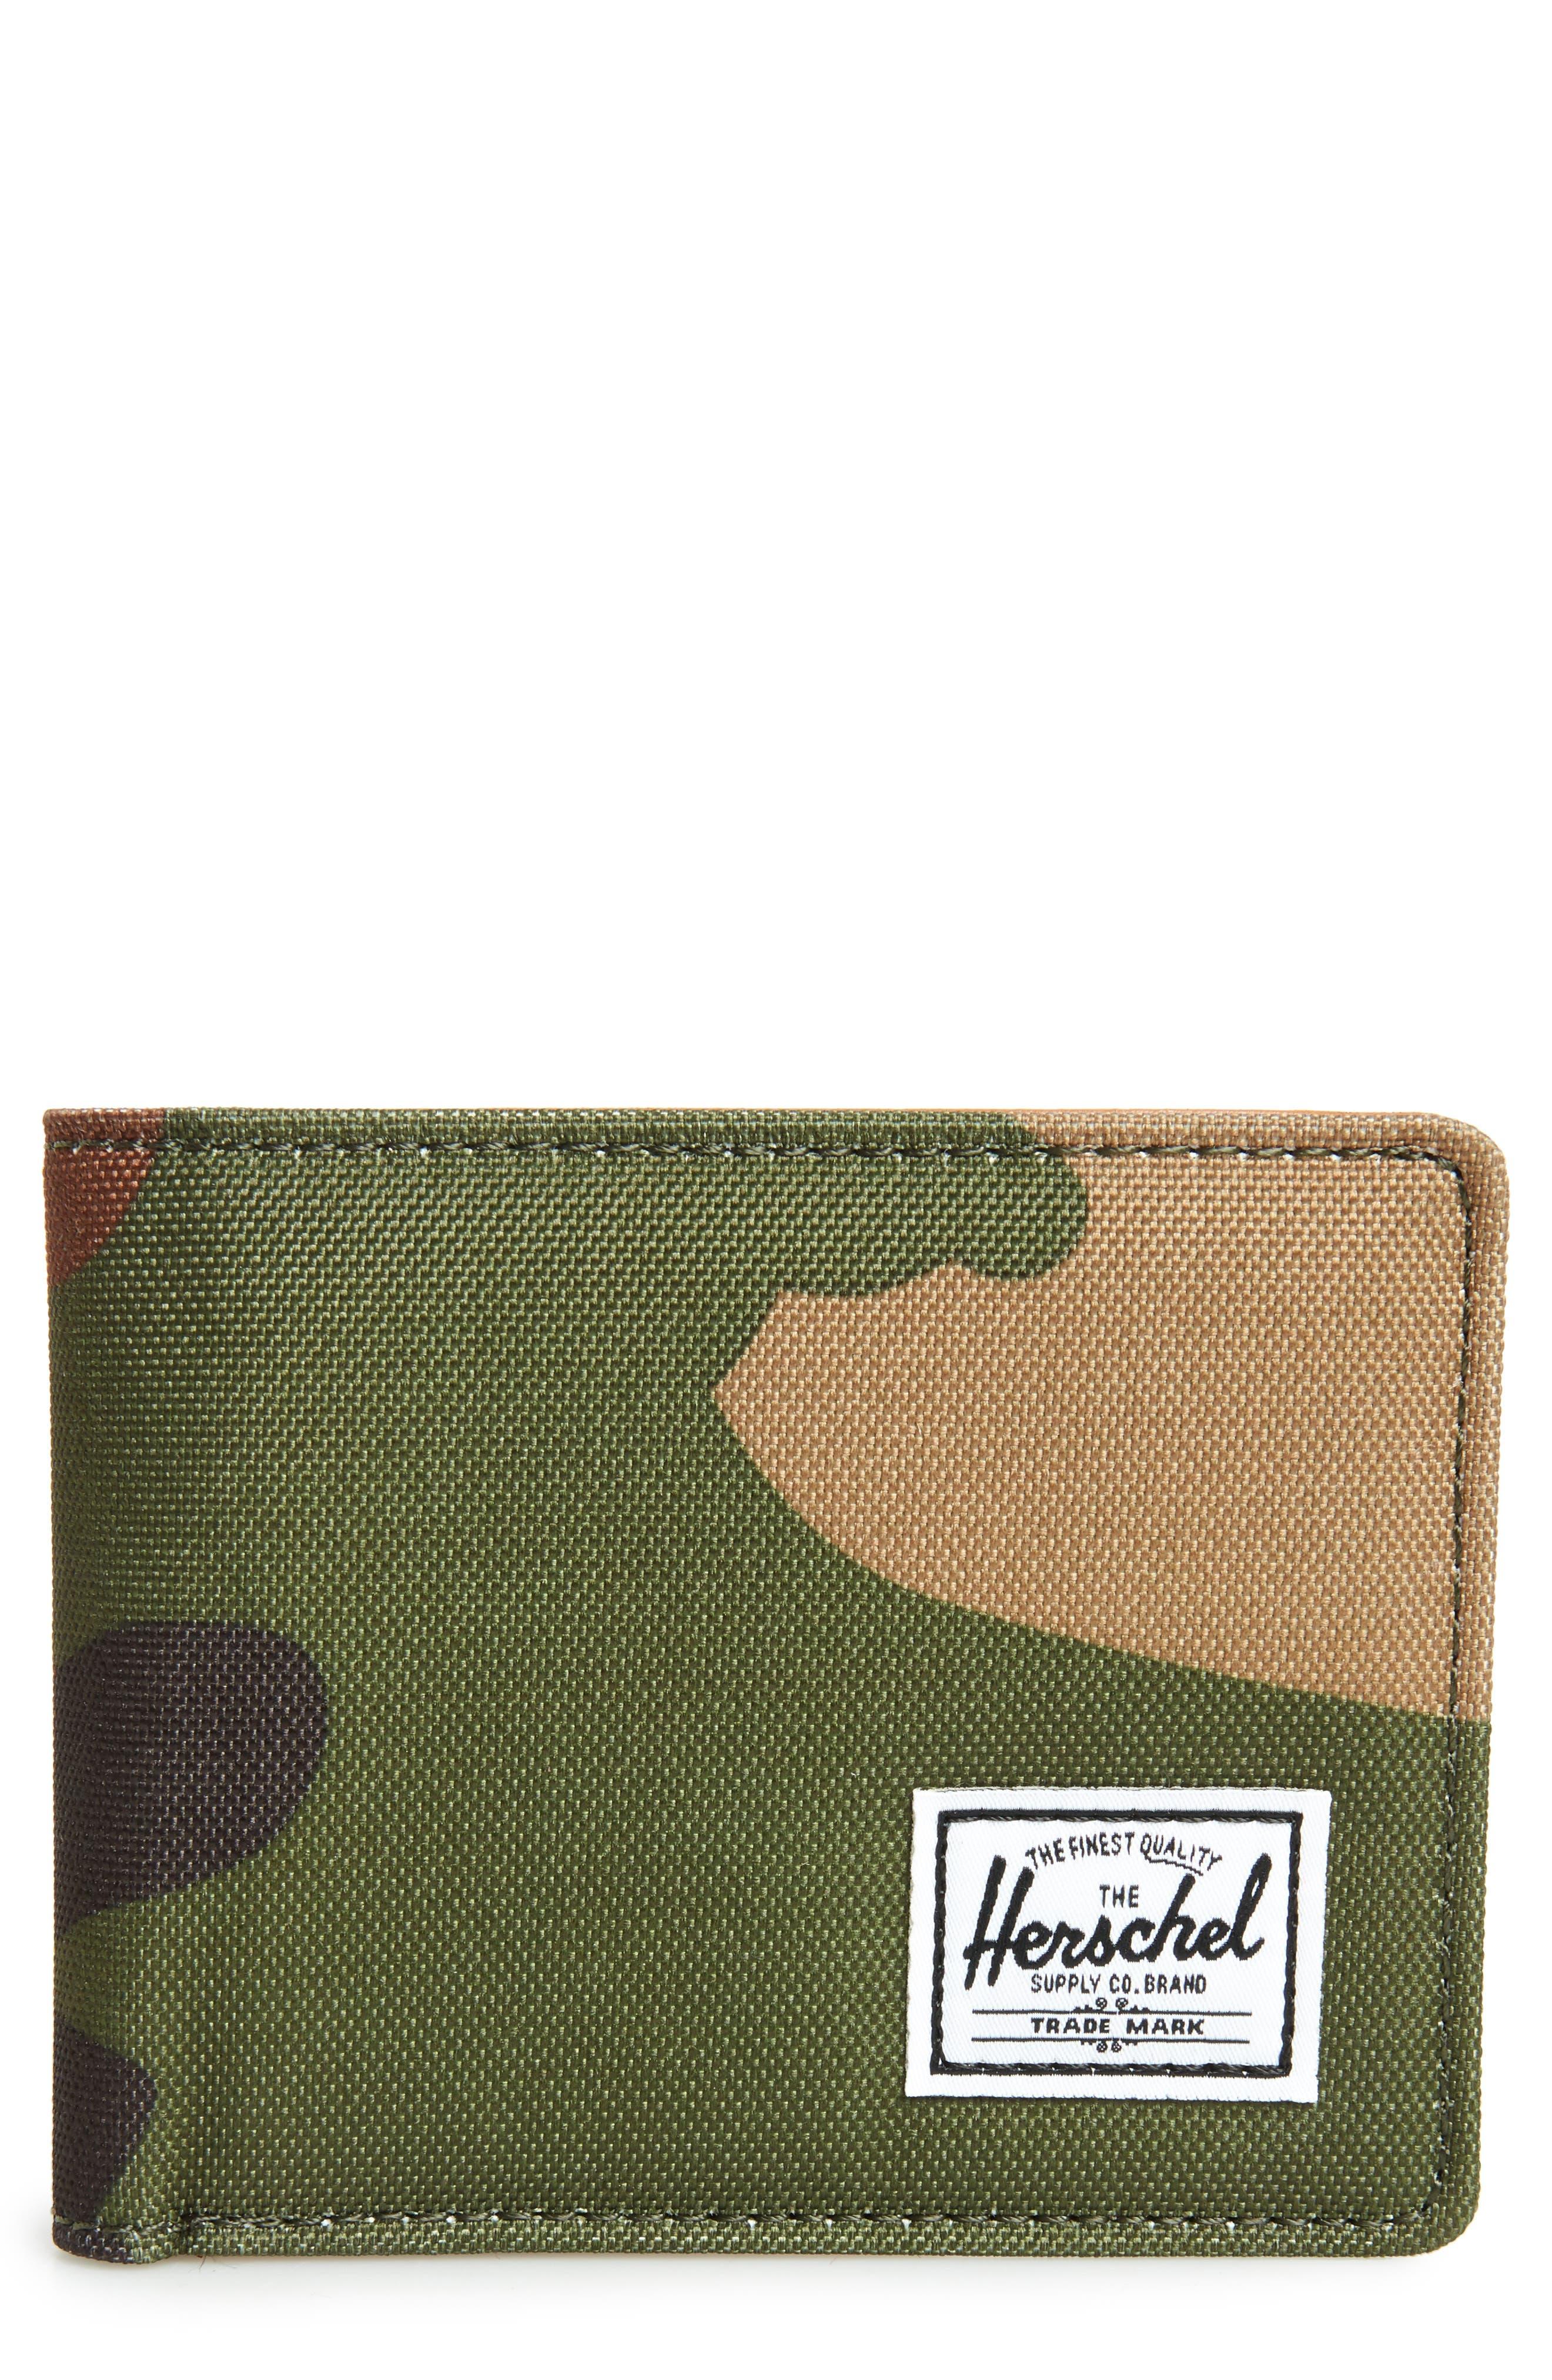 4518a3159027 Men s Green Wallets